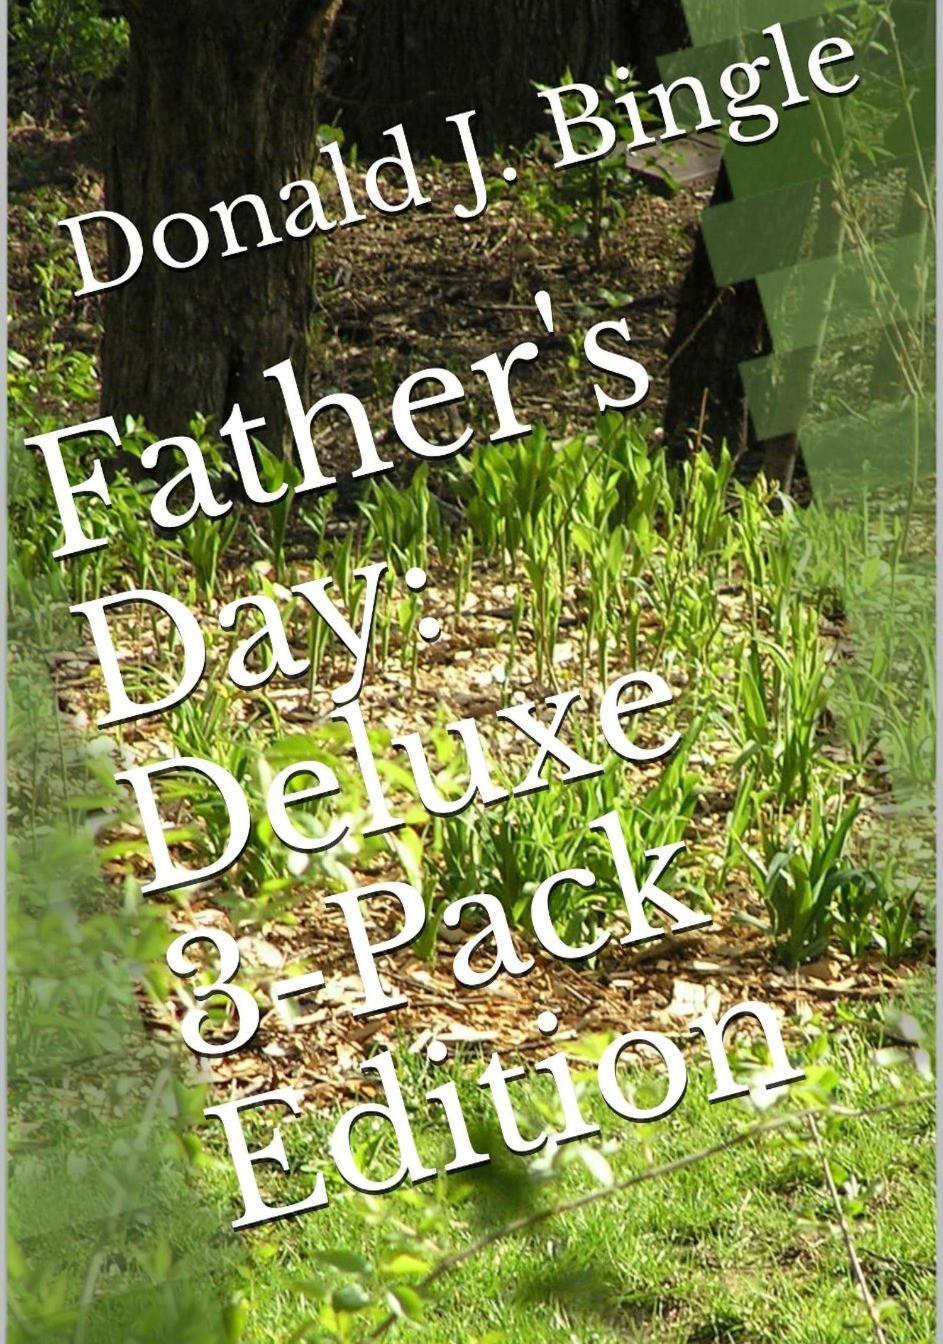 Father'sDayDeluxe3PackKindle.jpg 2015-3-29-16:13:50